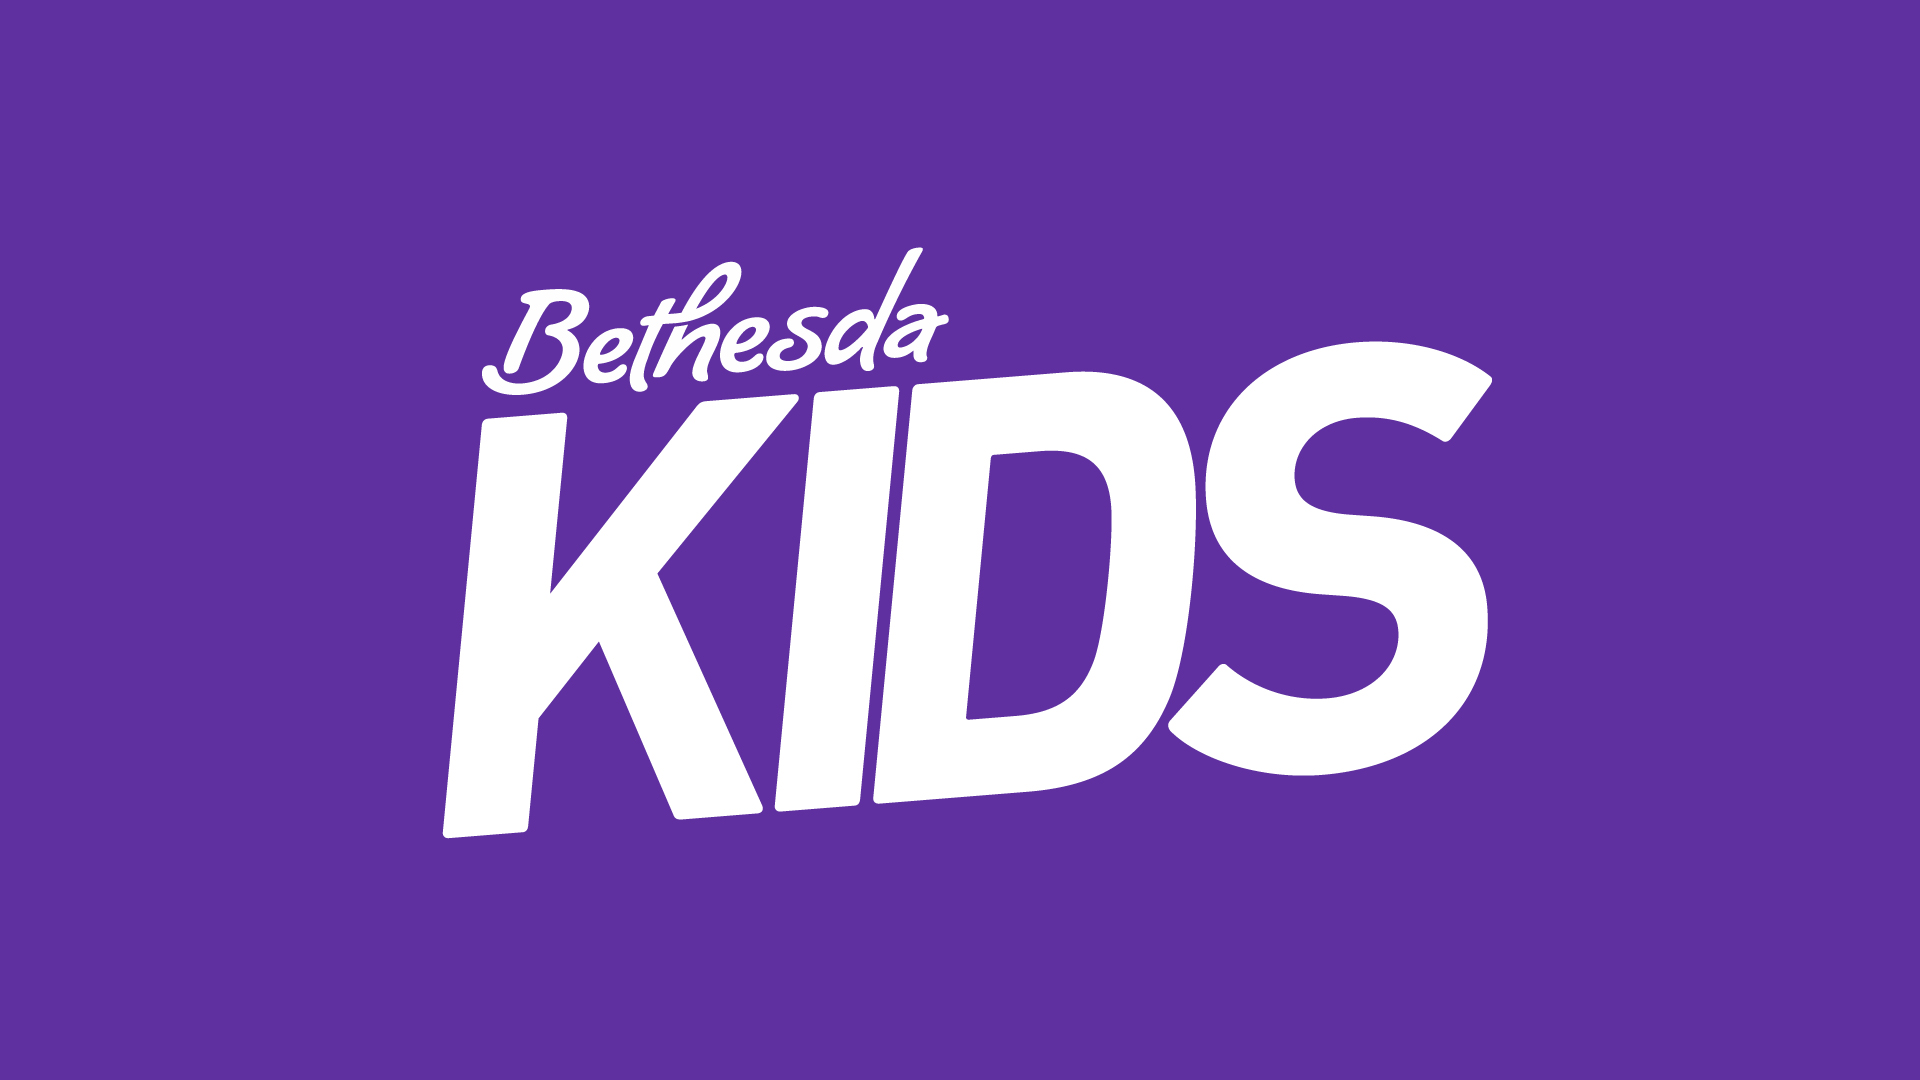 bethesda-kids.jpg